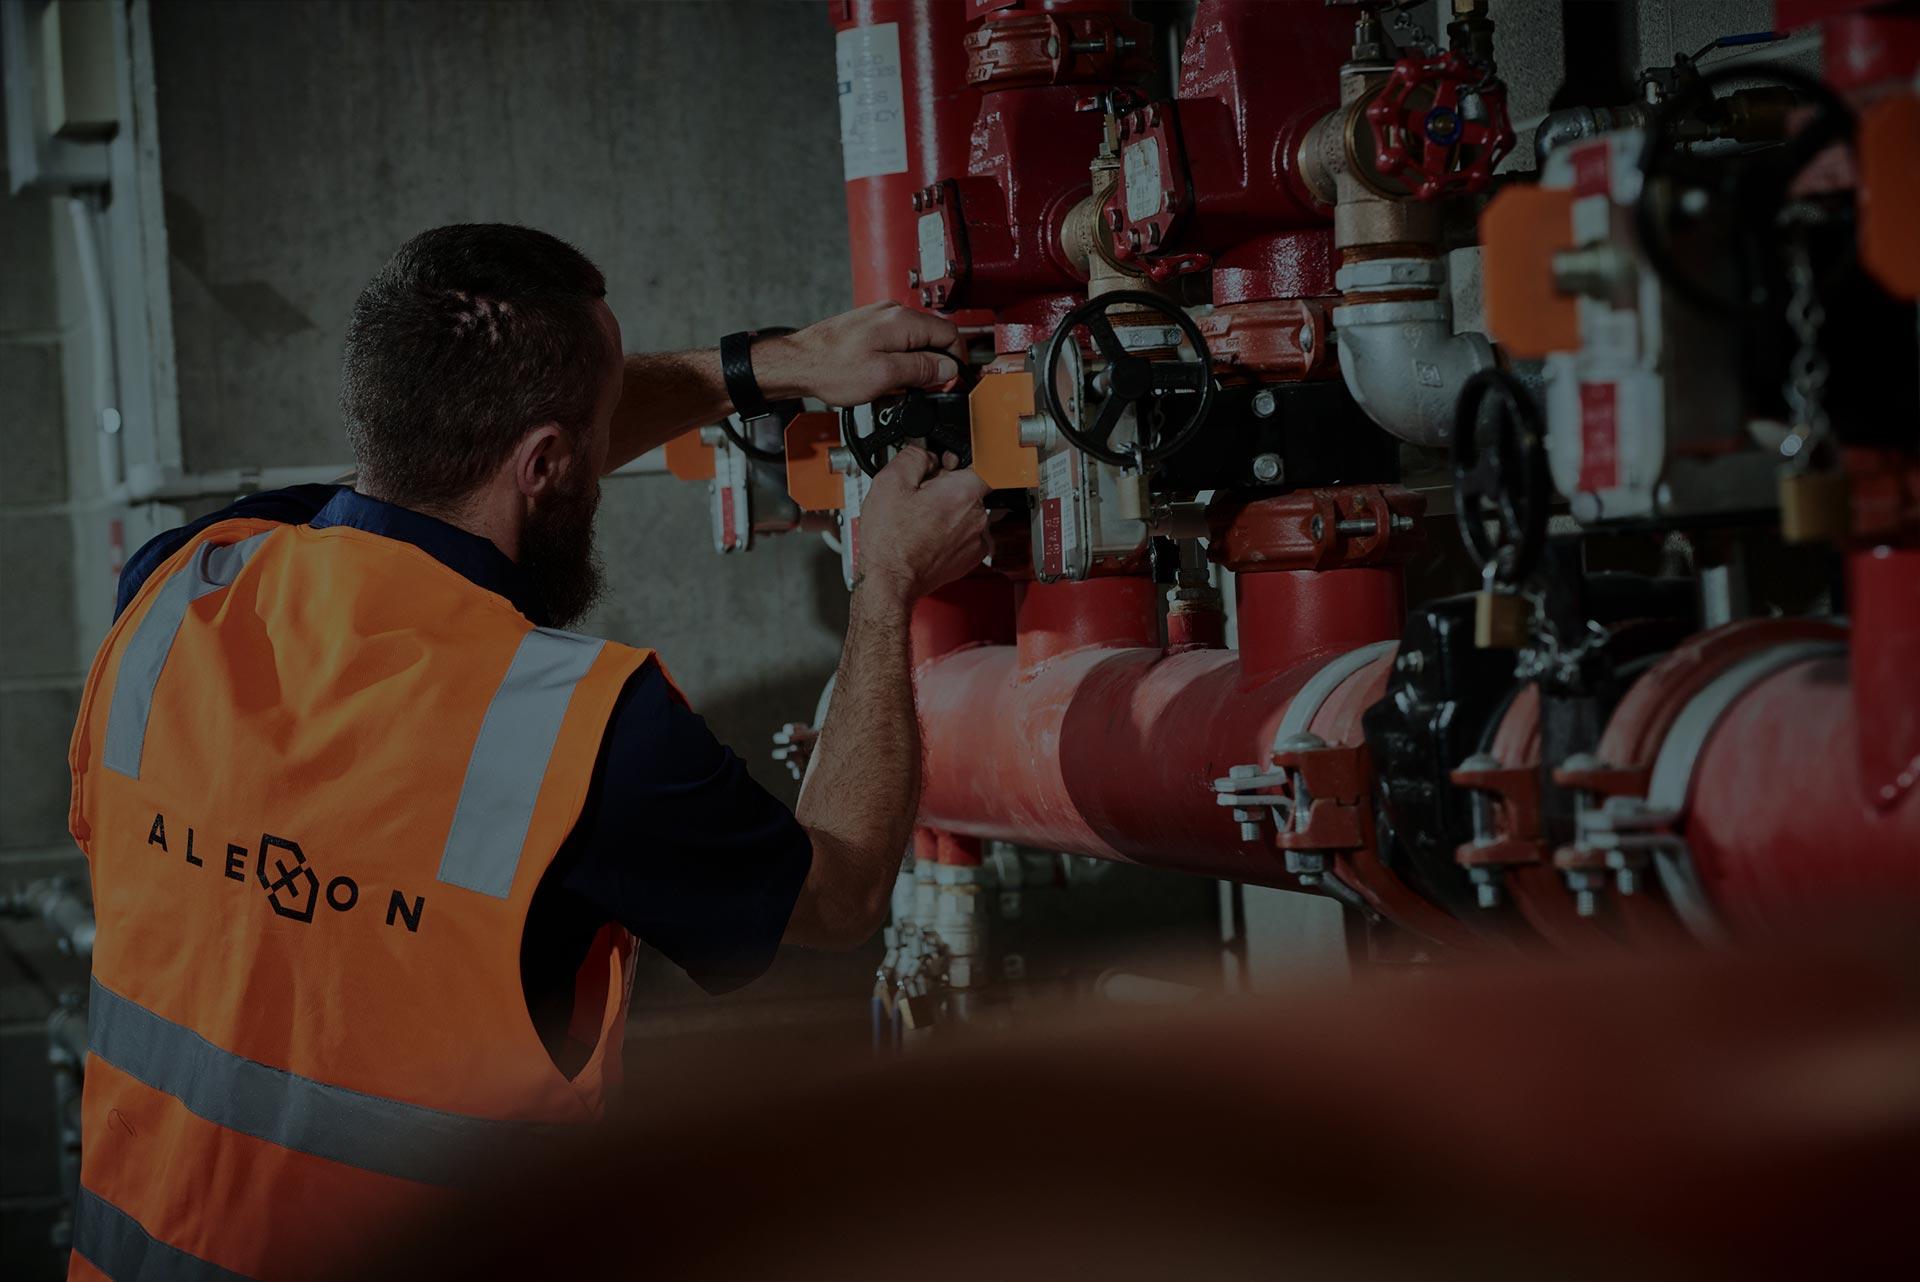 Alexon employee wearing Alexon branded safety gear doing maintenance work.